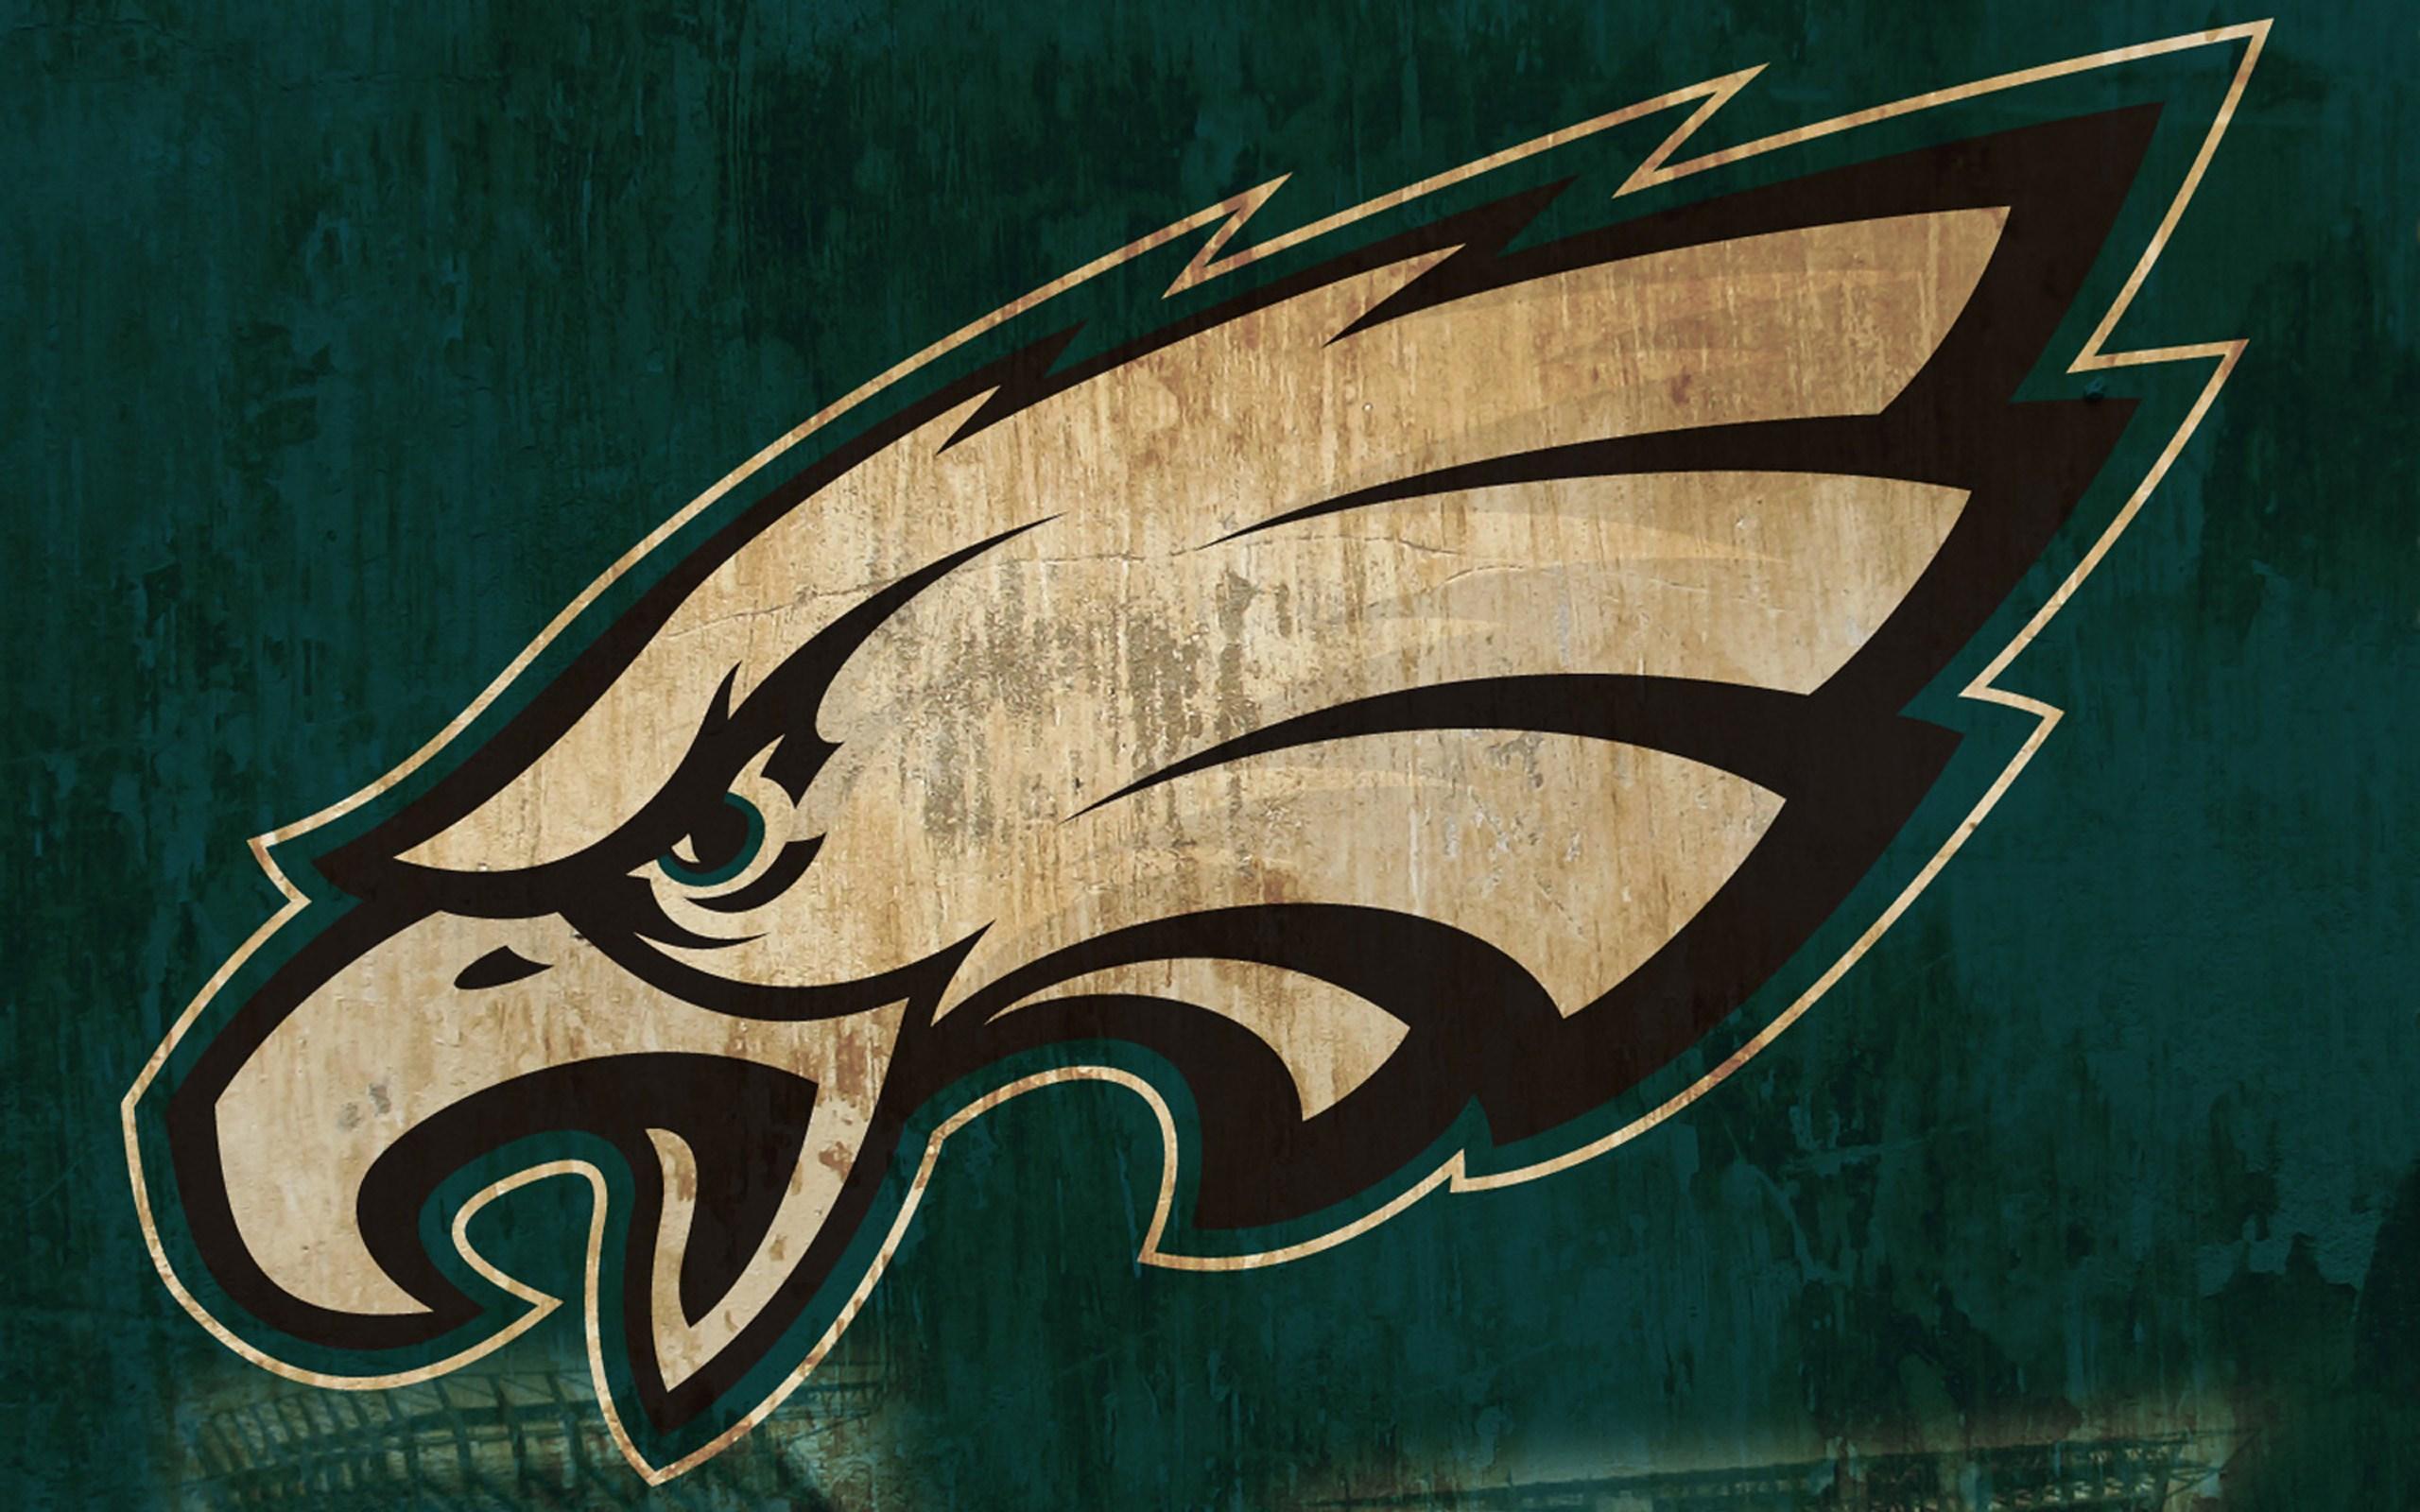 Beowulf-Bush-philadelphia-eagles-pack-1080p-hd-x-px-wallpaper-wp3403065